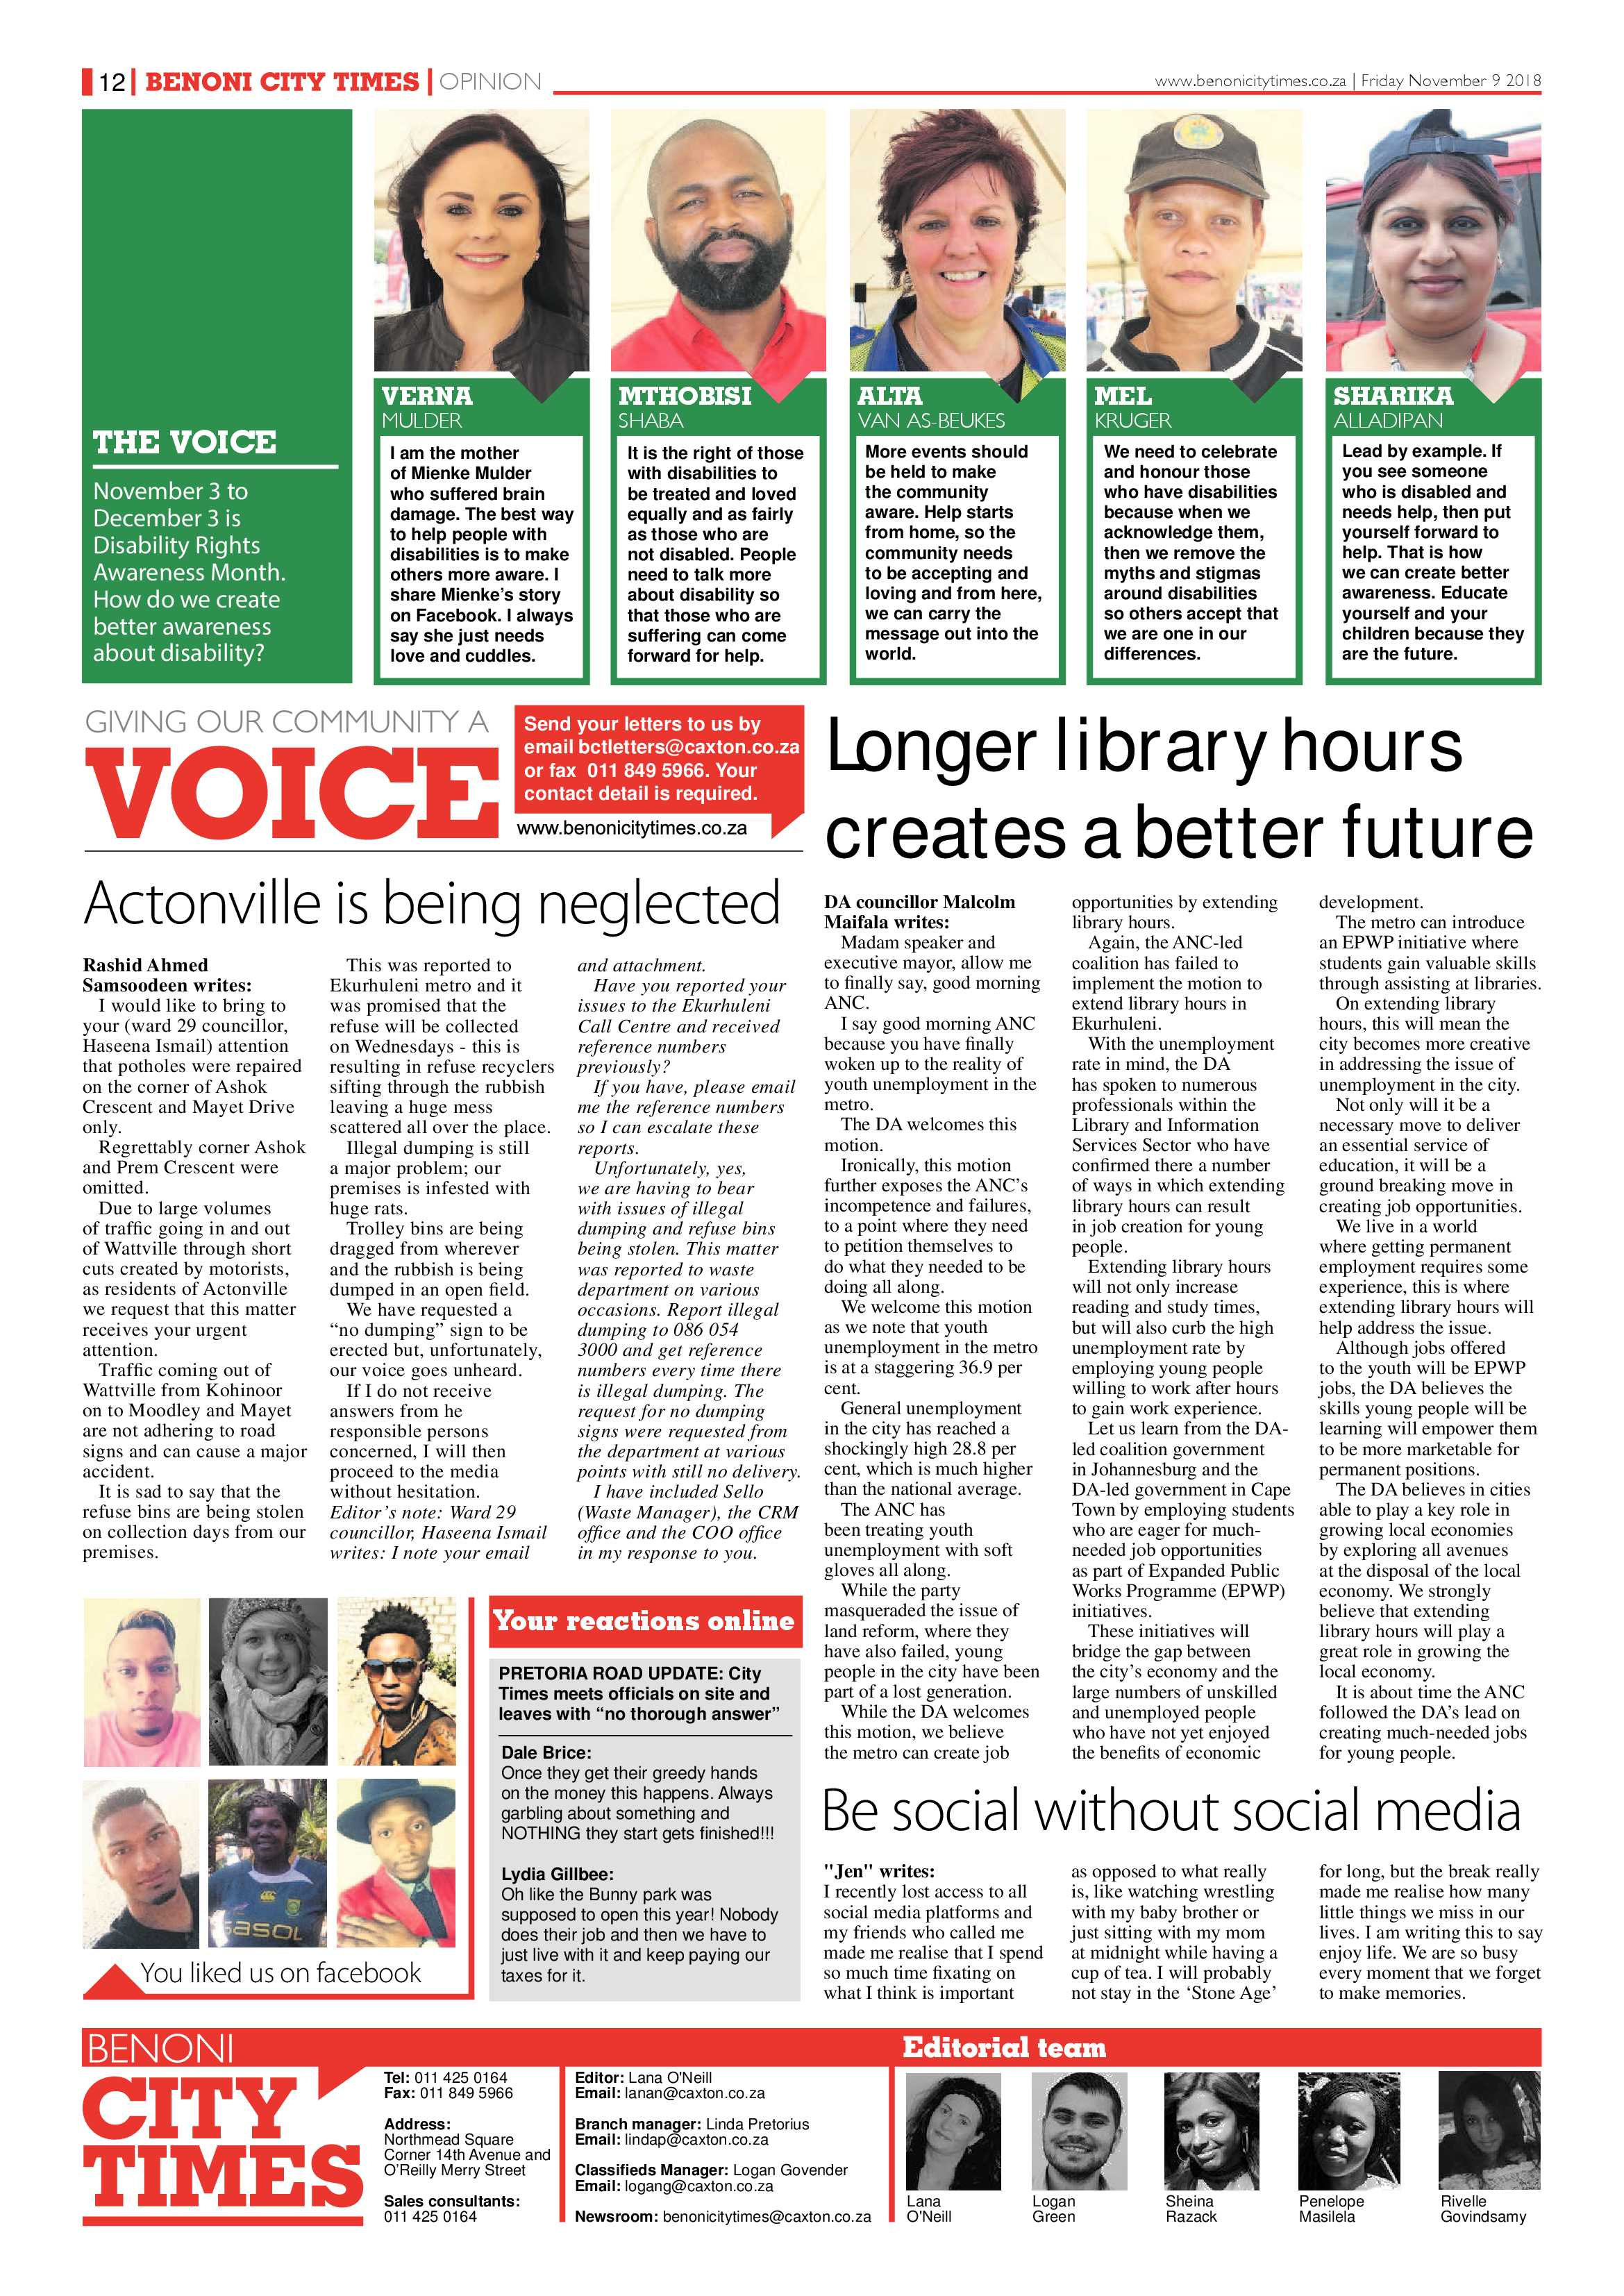 benoni-city-times-08-november-2018-epapers-page-12